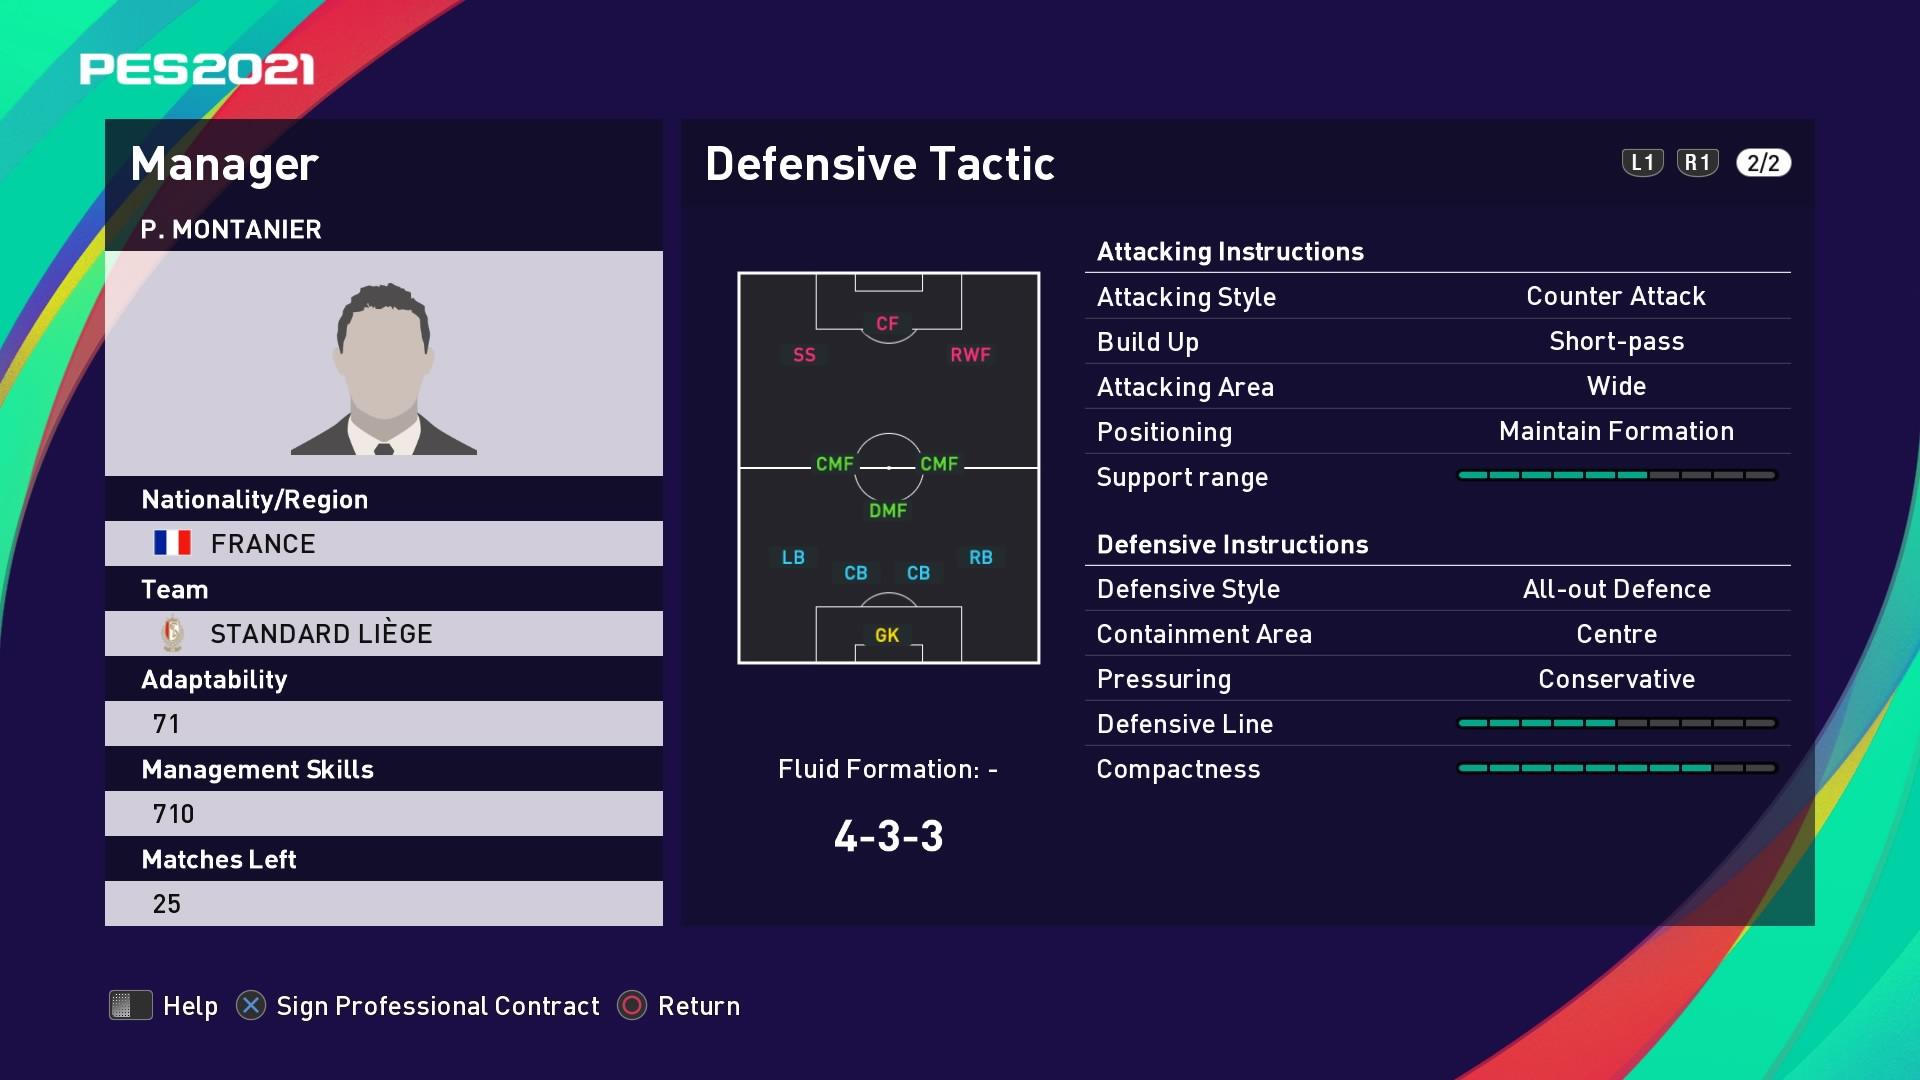 P. Montanier (Michel Preud'homme) Defensive Tactic in PES 2021 myClub